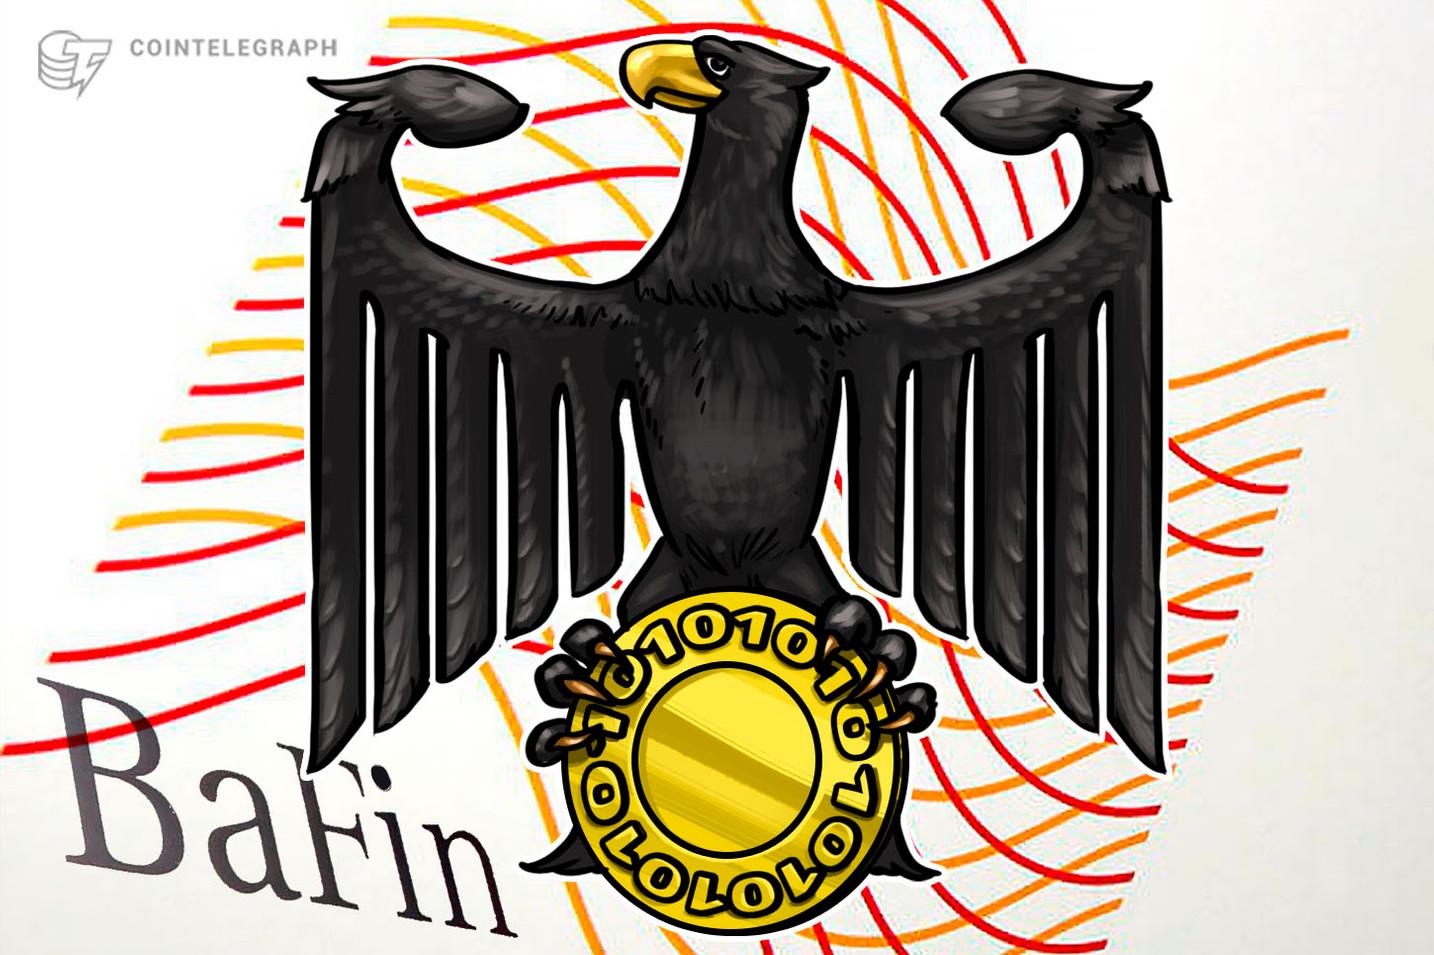 BaFin-Chef Hufeld fordert strengere Regulierung für Kryptowährungen